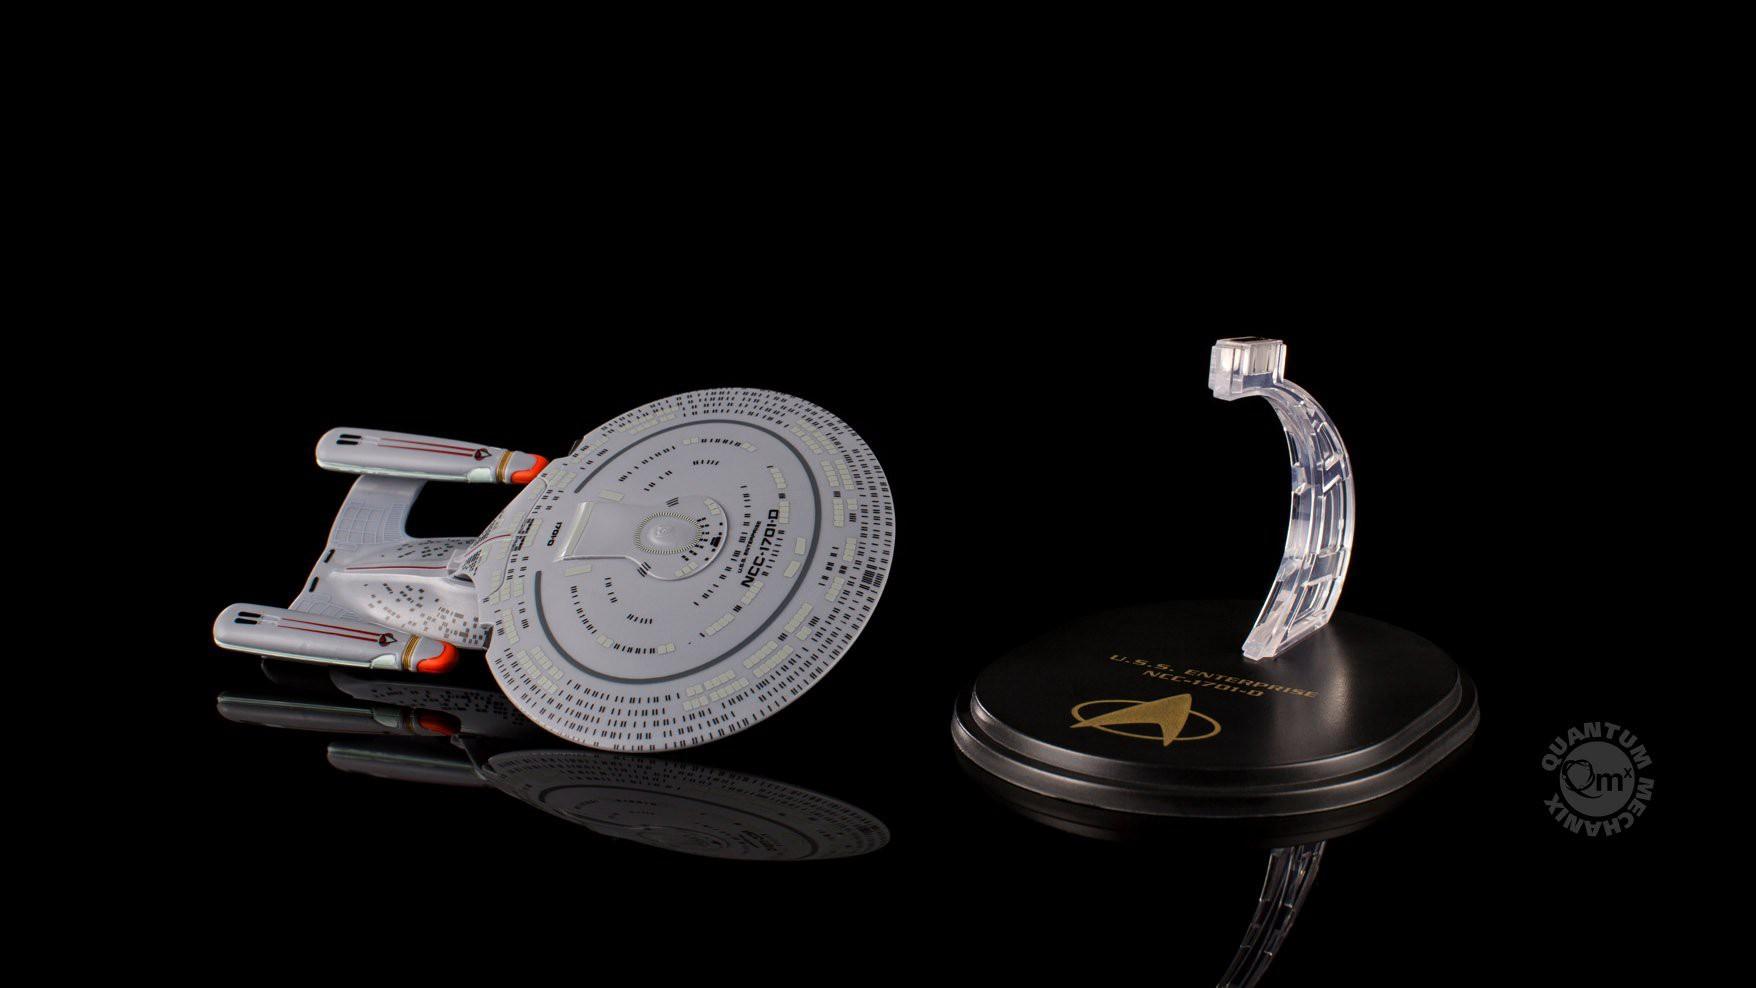 U.S.S. Enterprise NCC-1701D - Star Trek: The Next Generation - Mini Master Vehicles - Quantum Mechanix